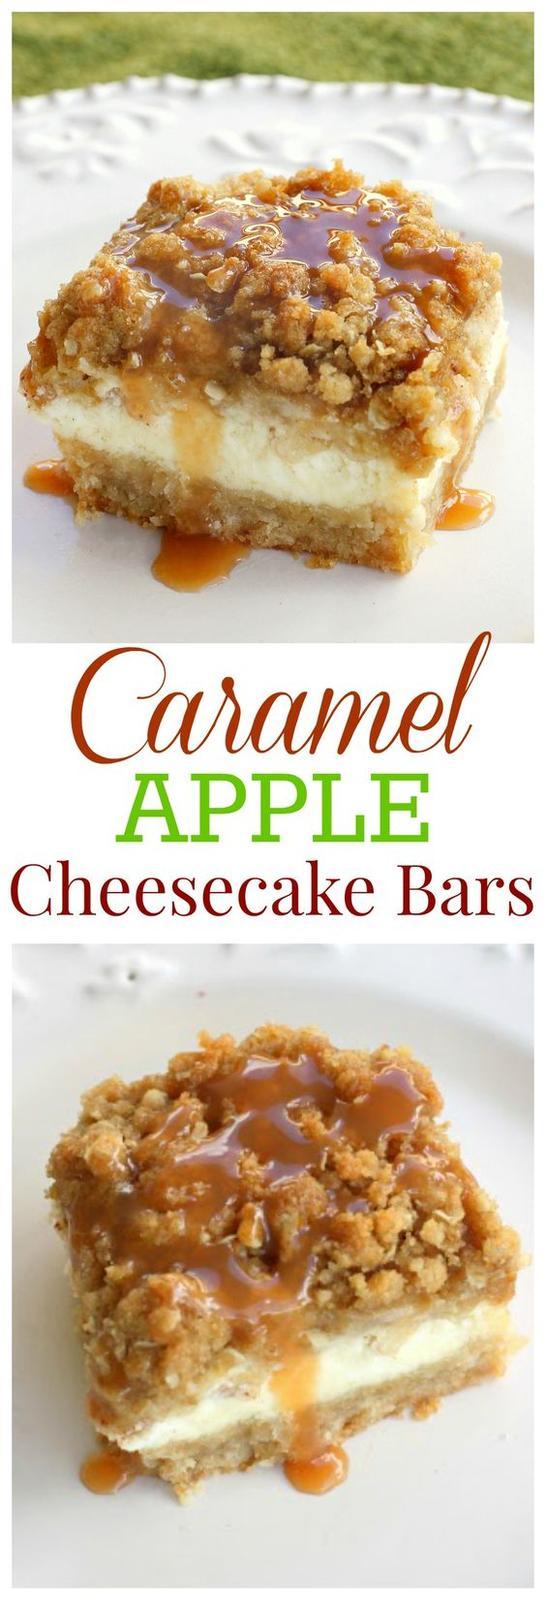 Americké koláčky - Caramel Apple Cheesecake Bars